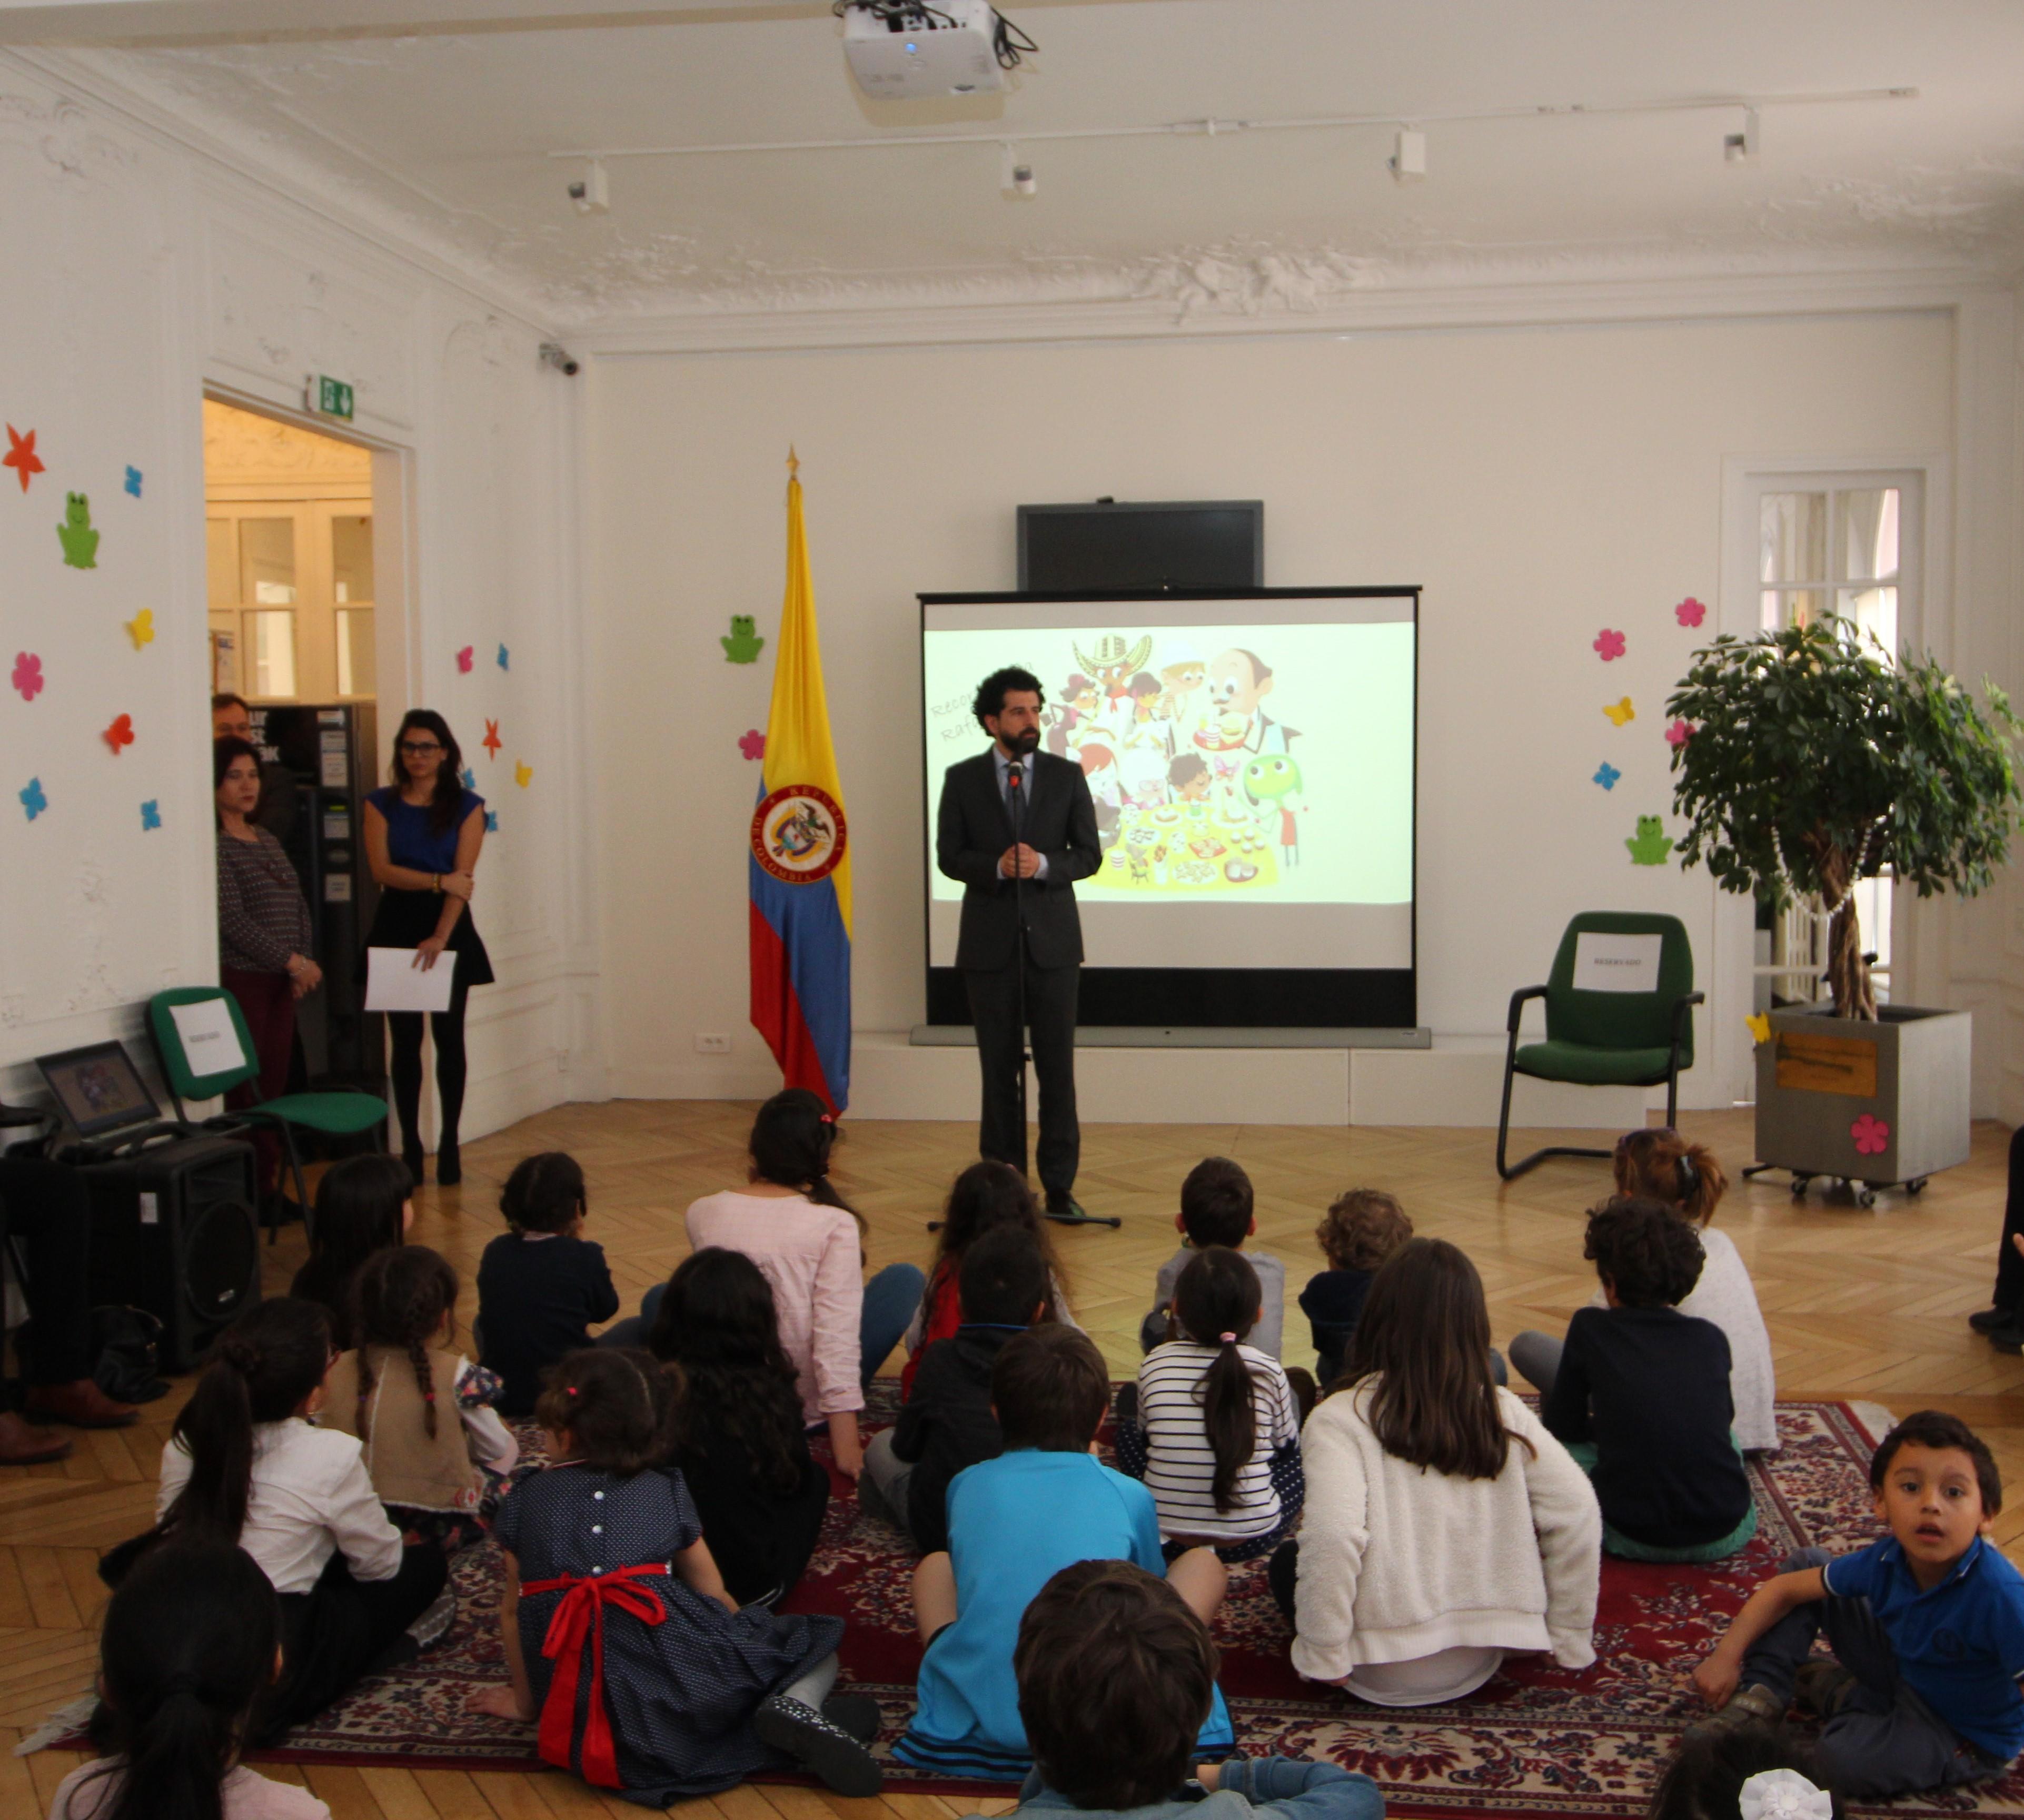 Con taller infantil el consulado de colombia en par s for Consul node js